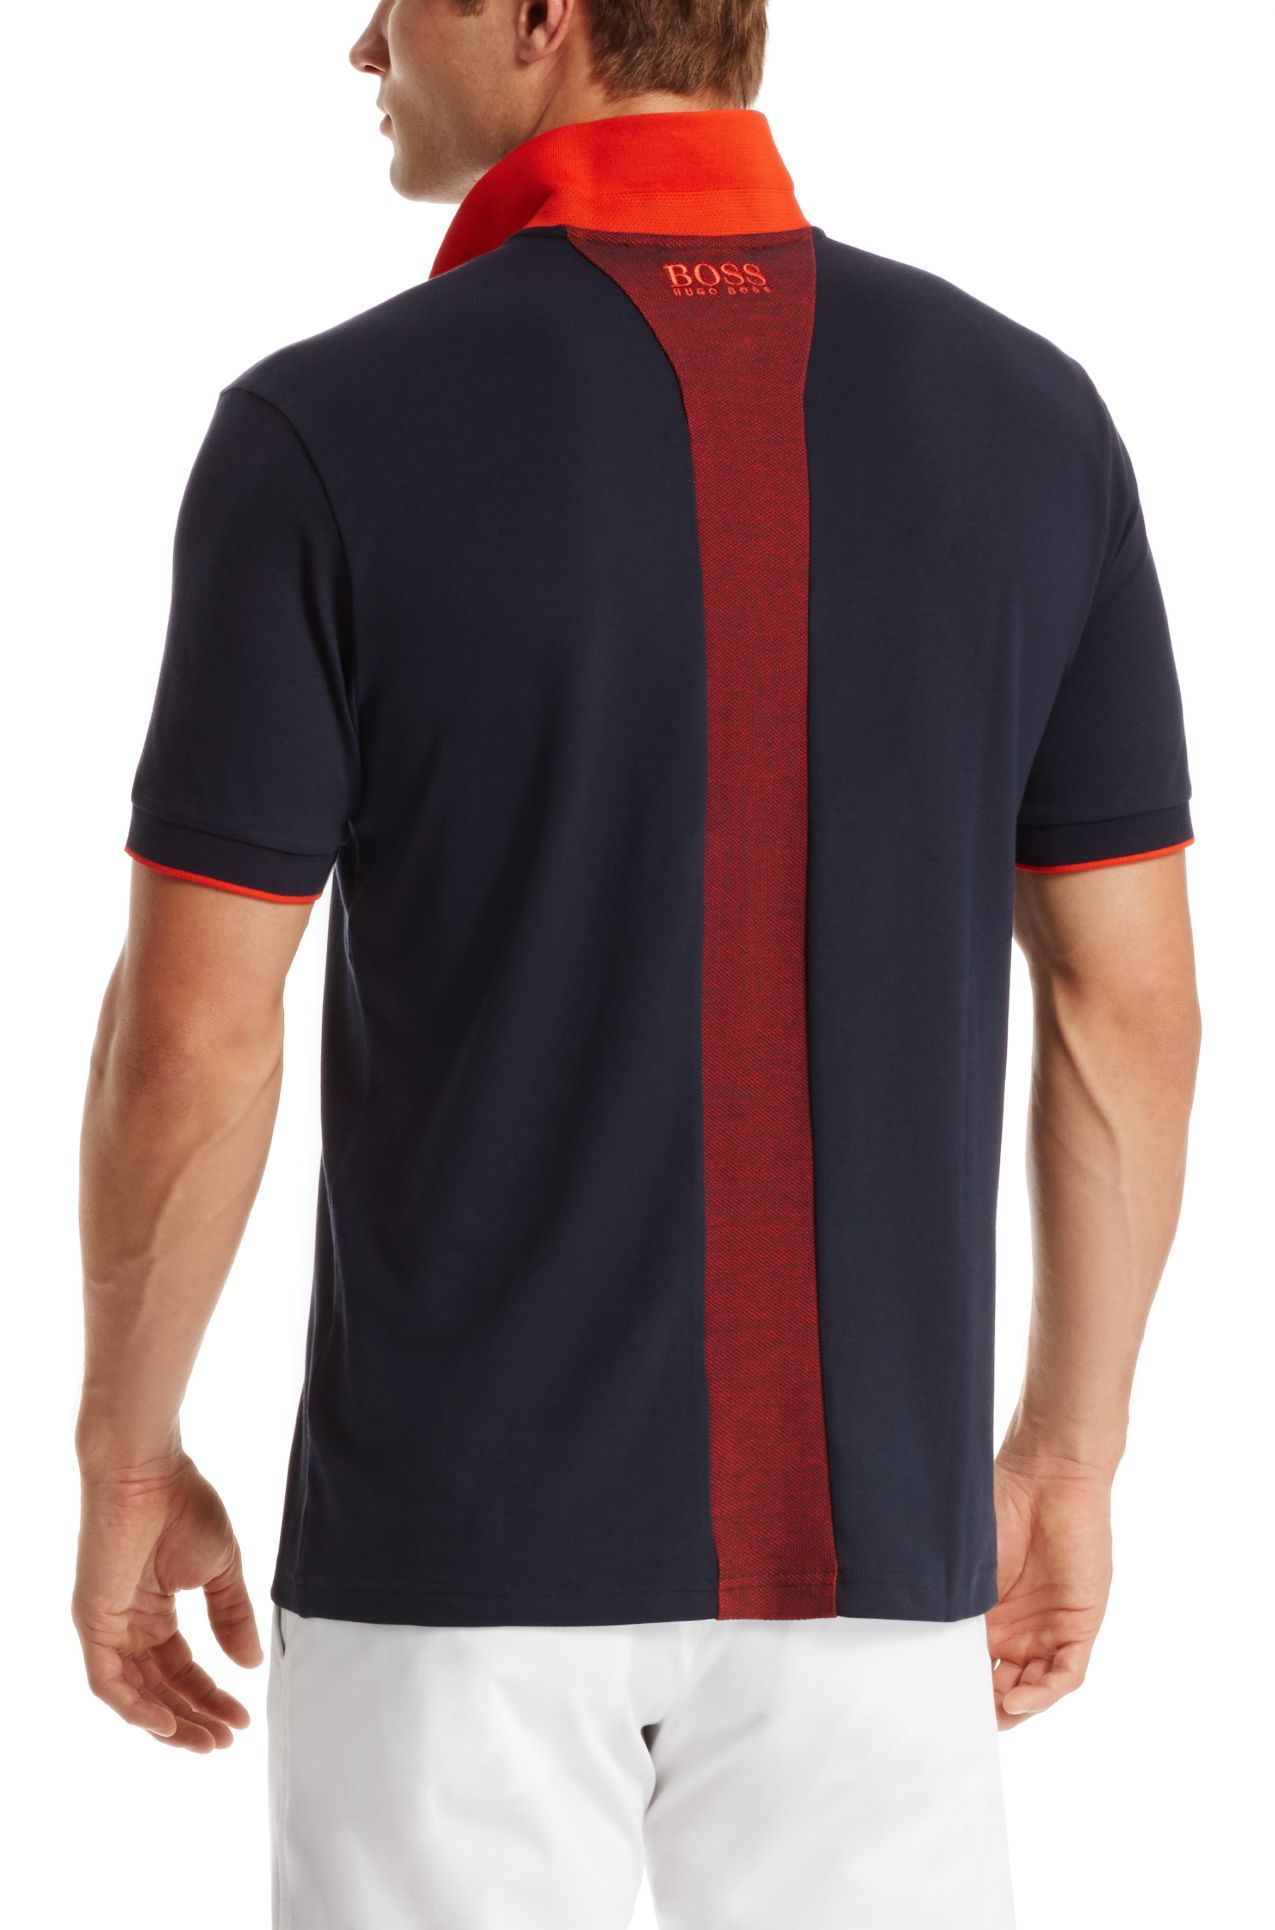 aa133a535 'Paddy MK' | Modern Fit, Moisture Manager Stretch Cotton Blend Polo Shirt ,  Dark Blue